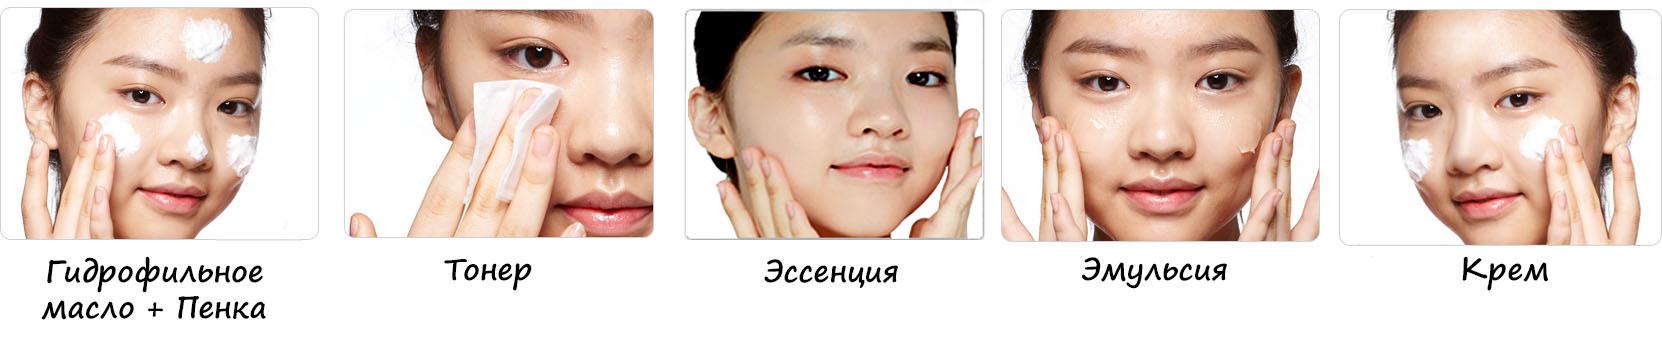 Почему у кореянок такая чистая кожа